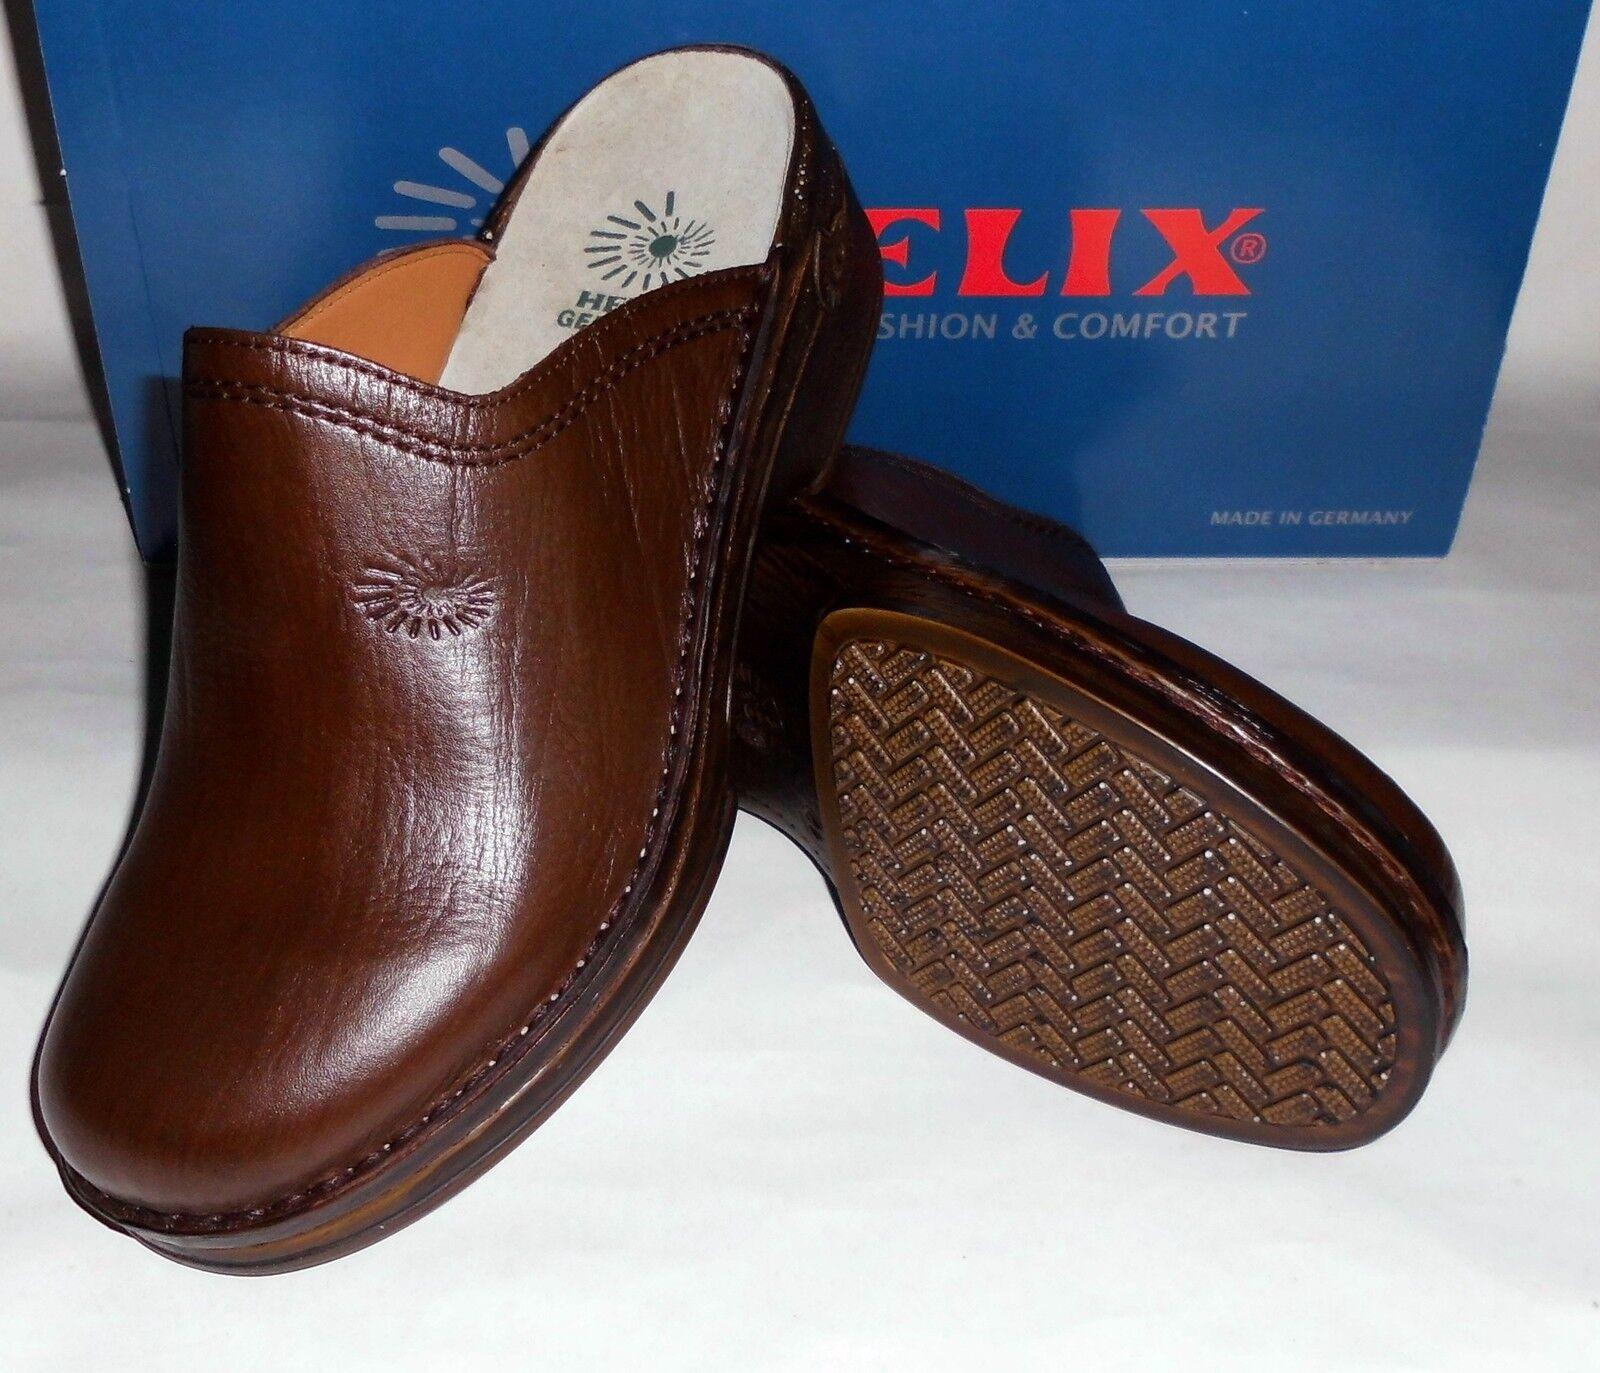 Helix Clogs Braun Burma Leder Fußbett  Markenqualität Pantoffeln neu  | Zu einem niedrigeren Preis